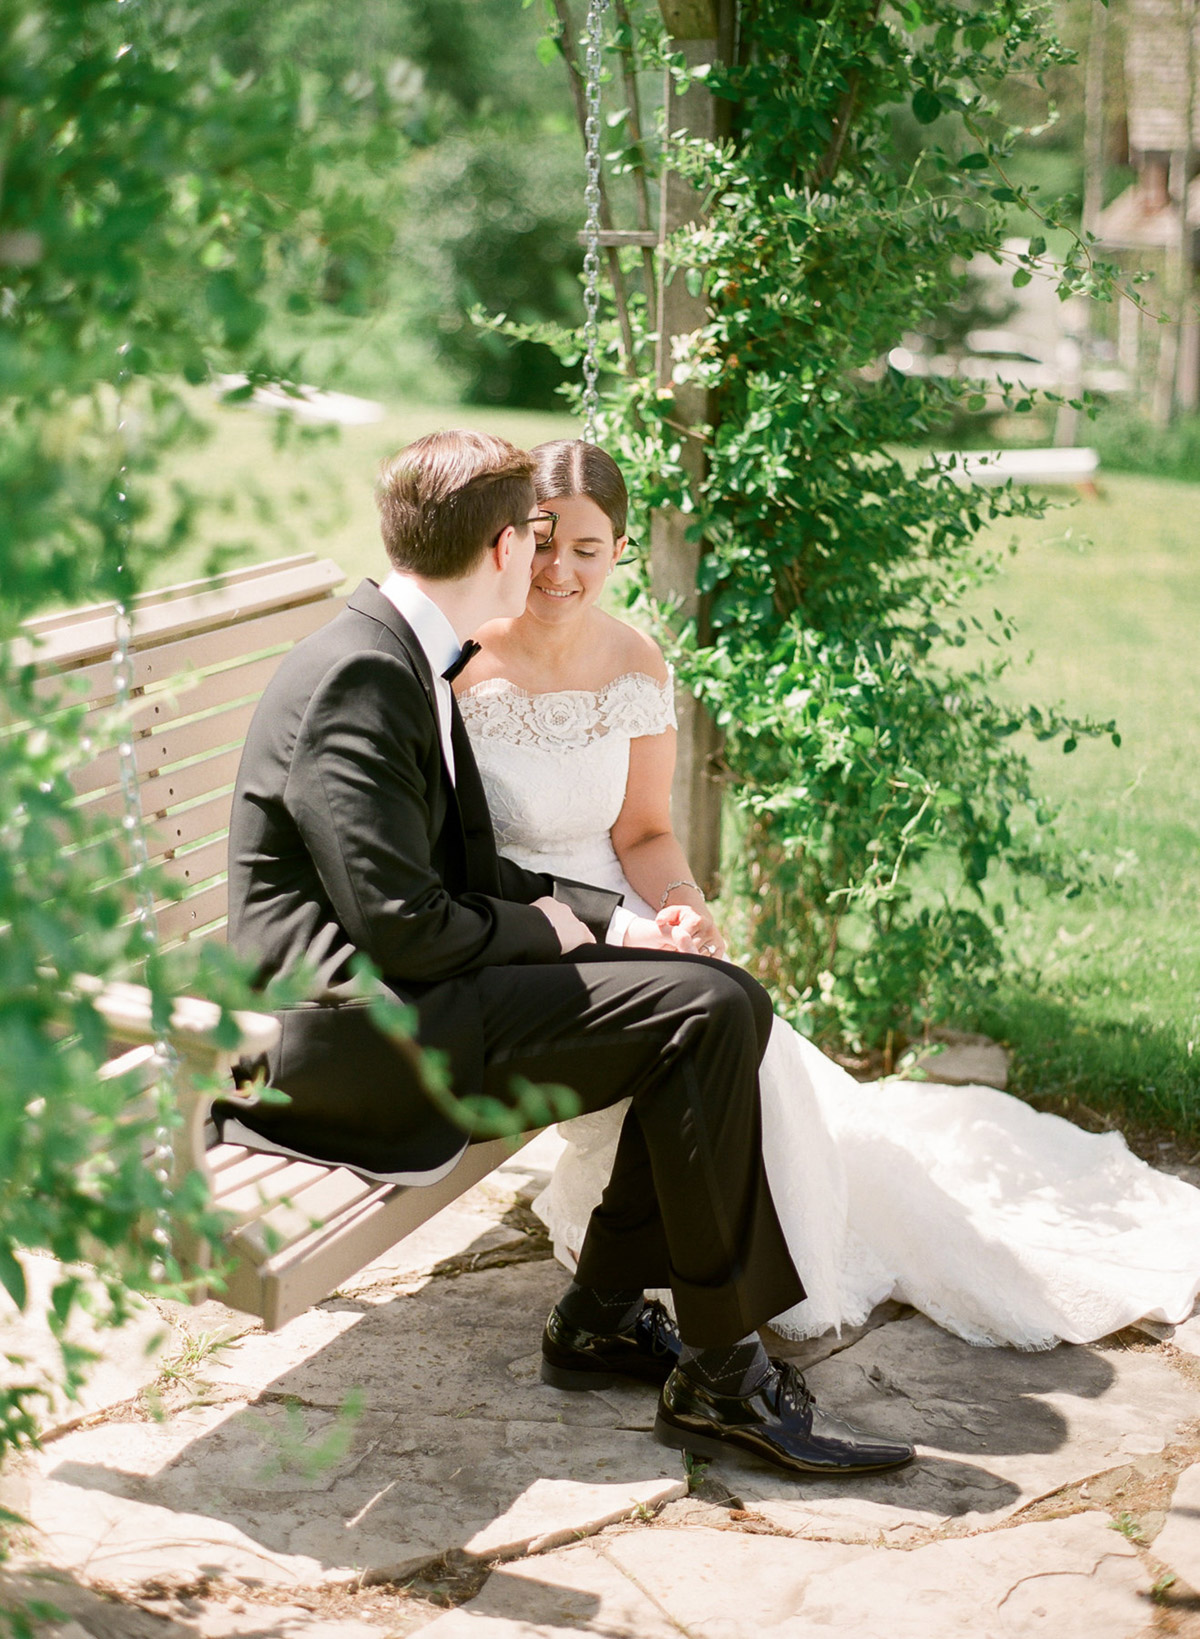 artiese-studios-vineyard-bride-swish-list-private-estate-cambridge-wedding-24.jpg